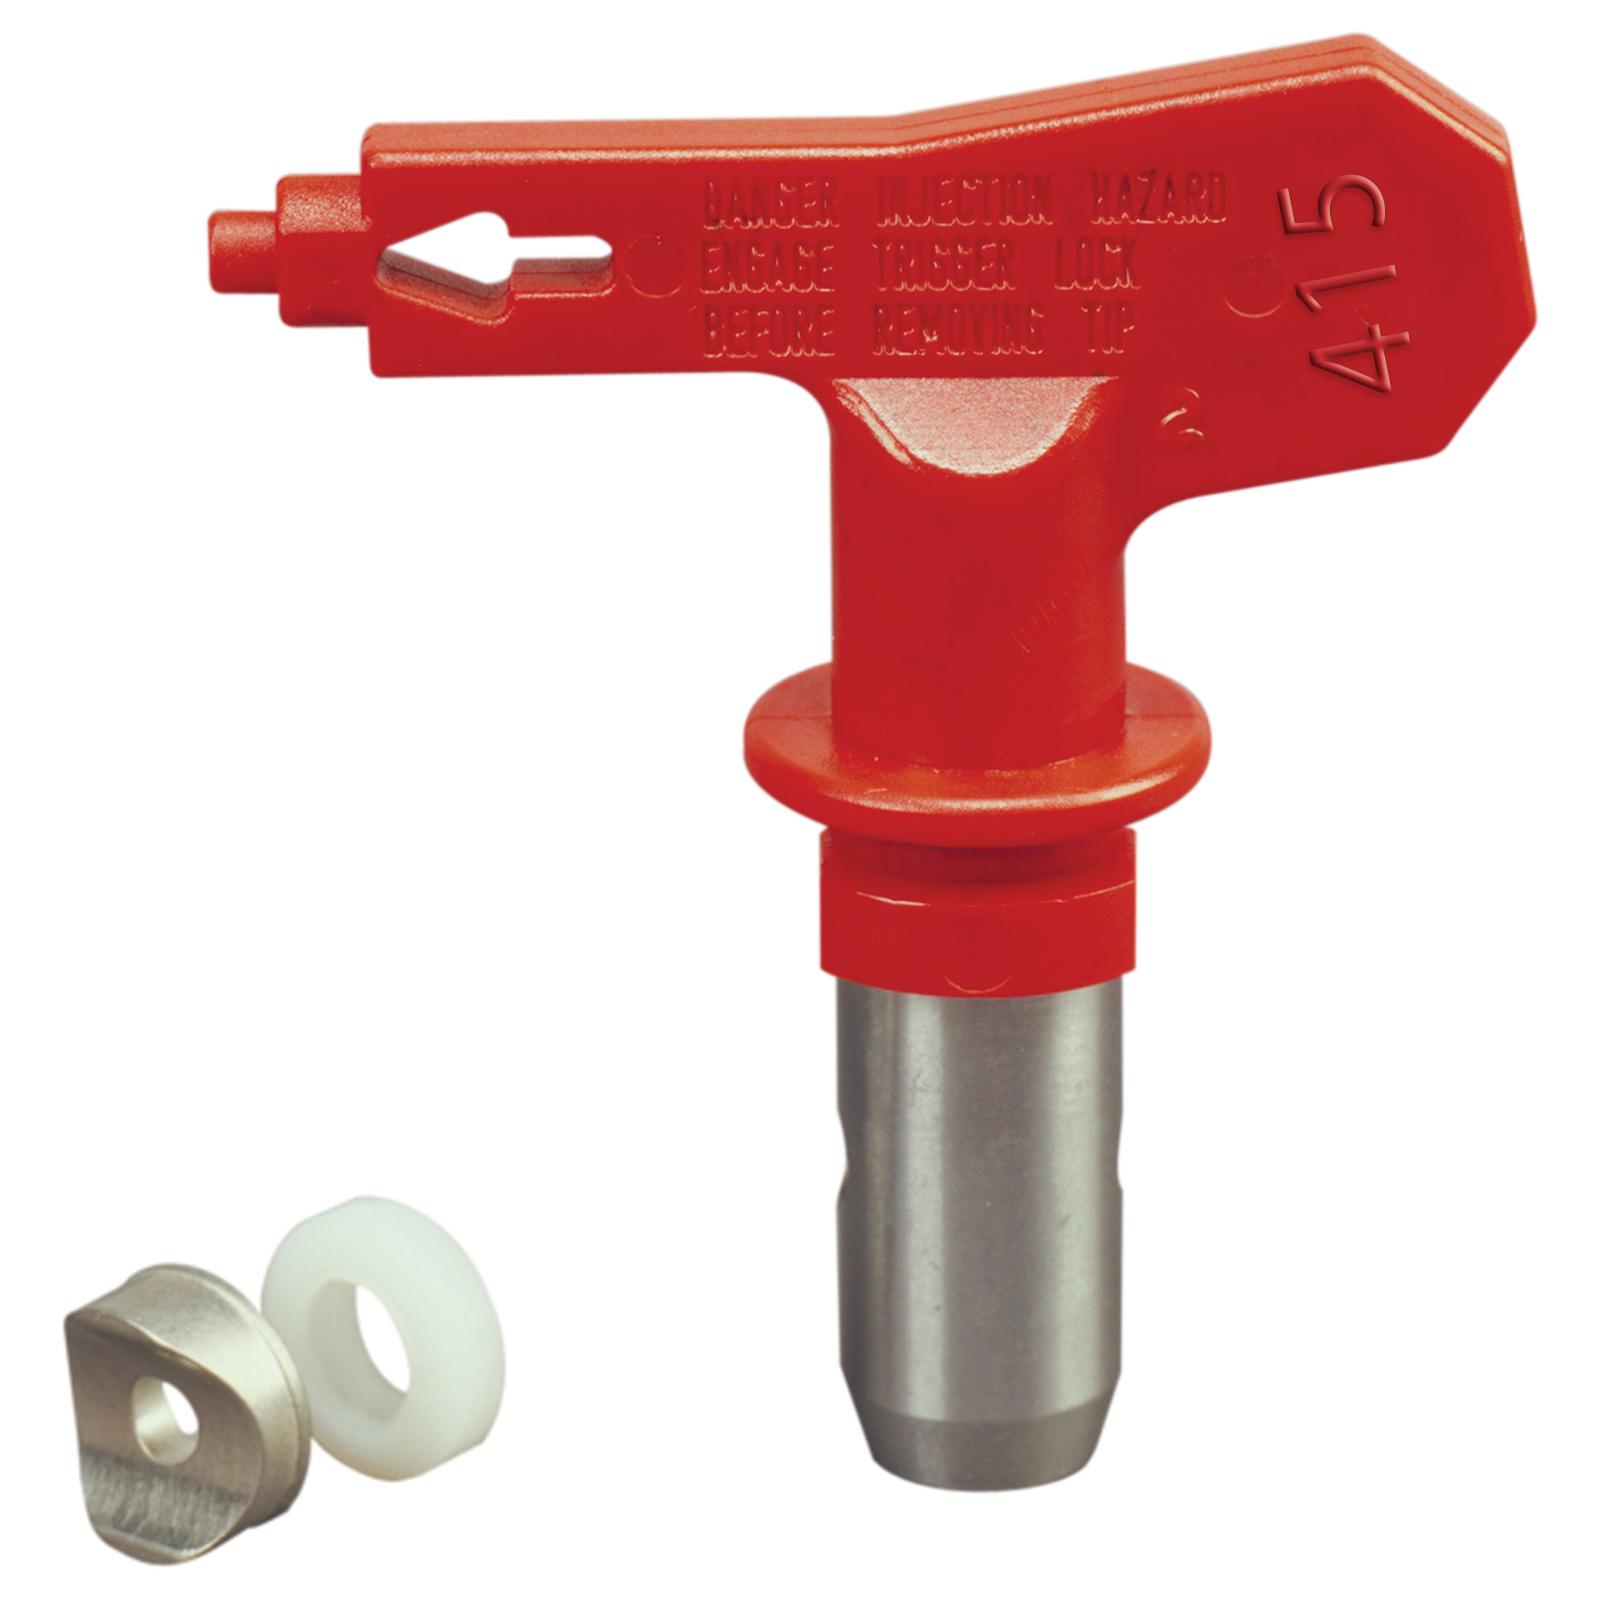 Titan SC6+ Standard 415 Spray Gun Tip